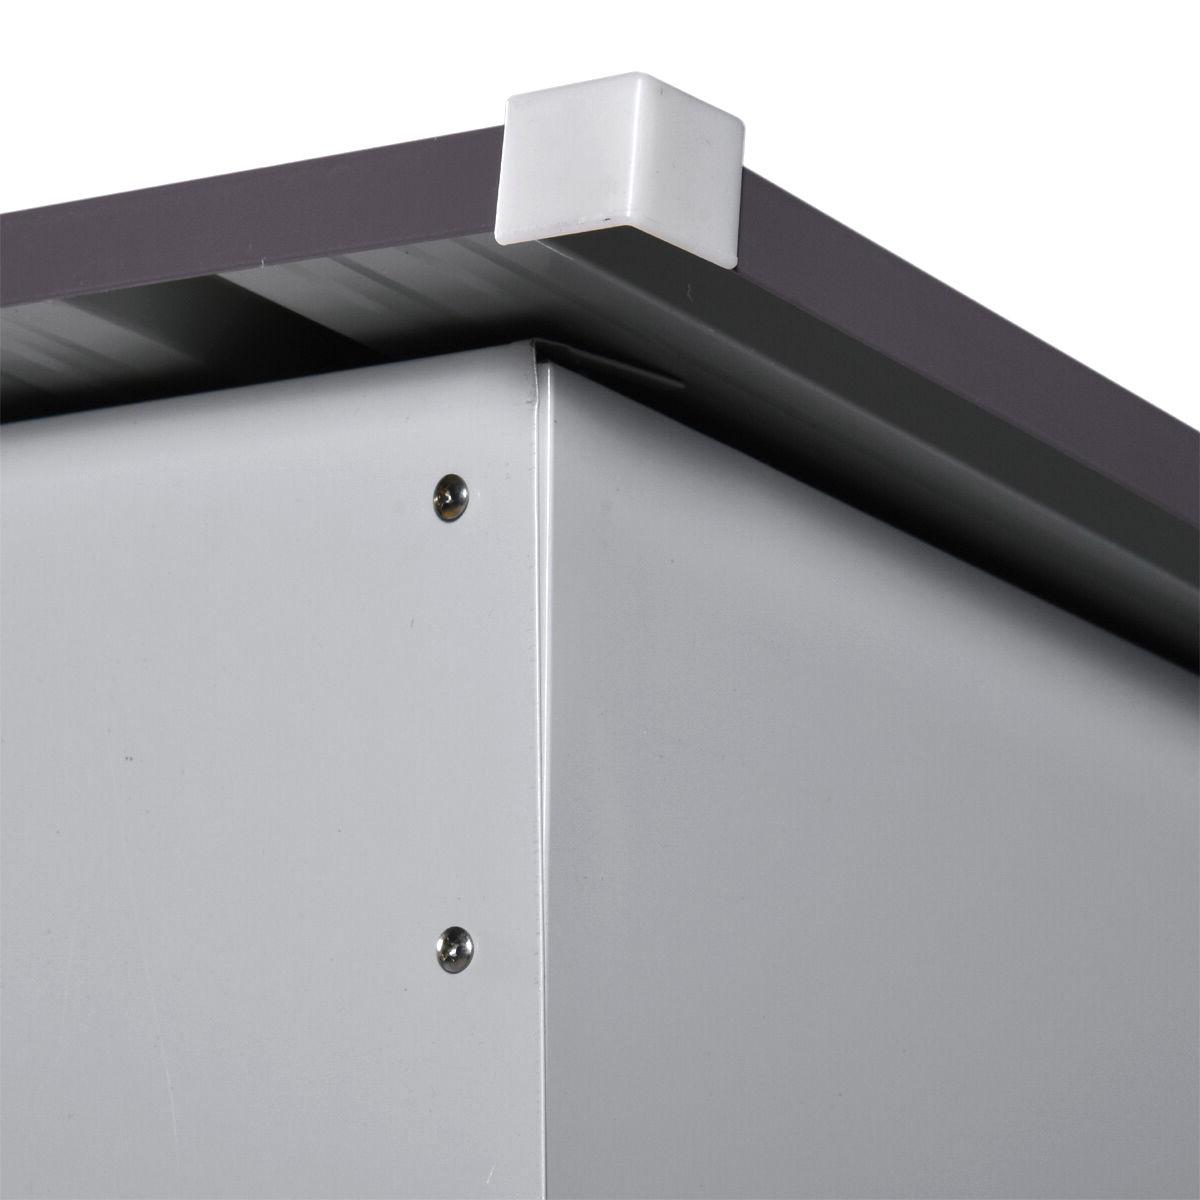 4' x Storage Shed Box Steel Utility Lawn